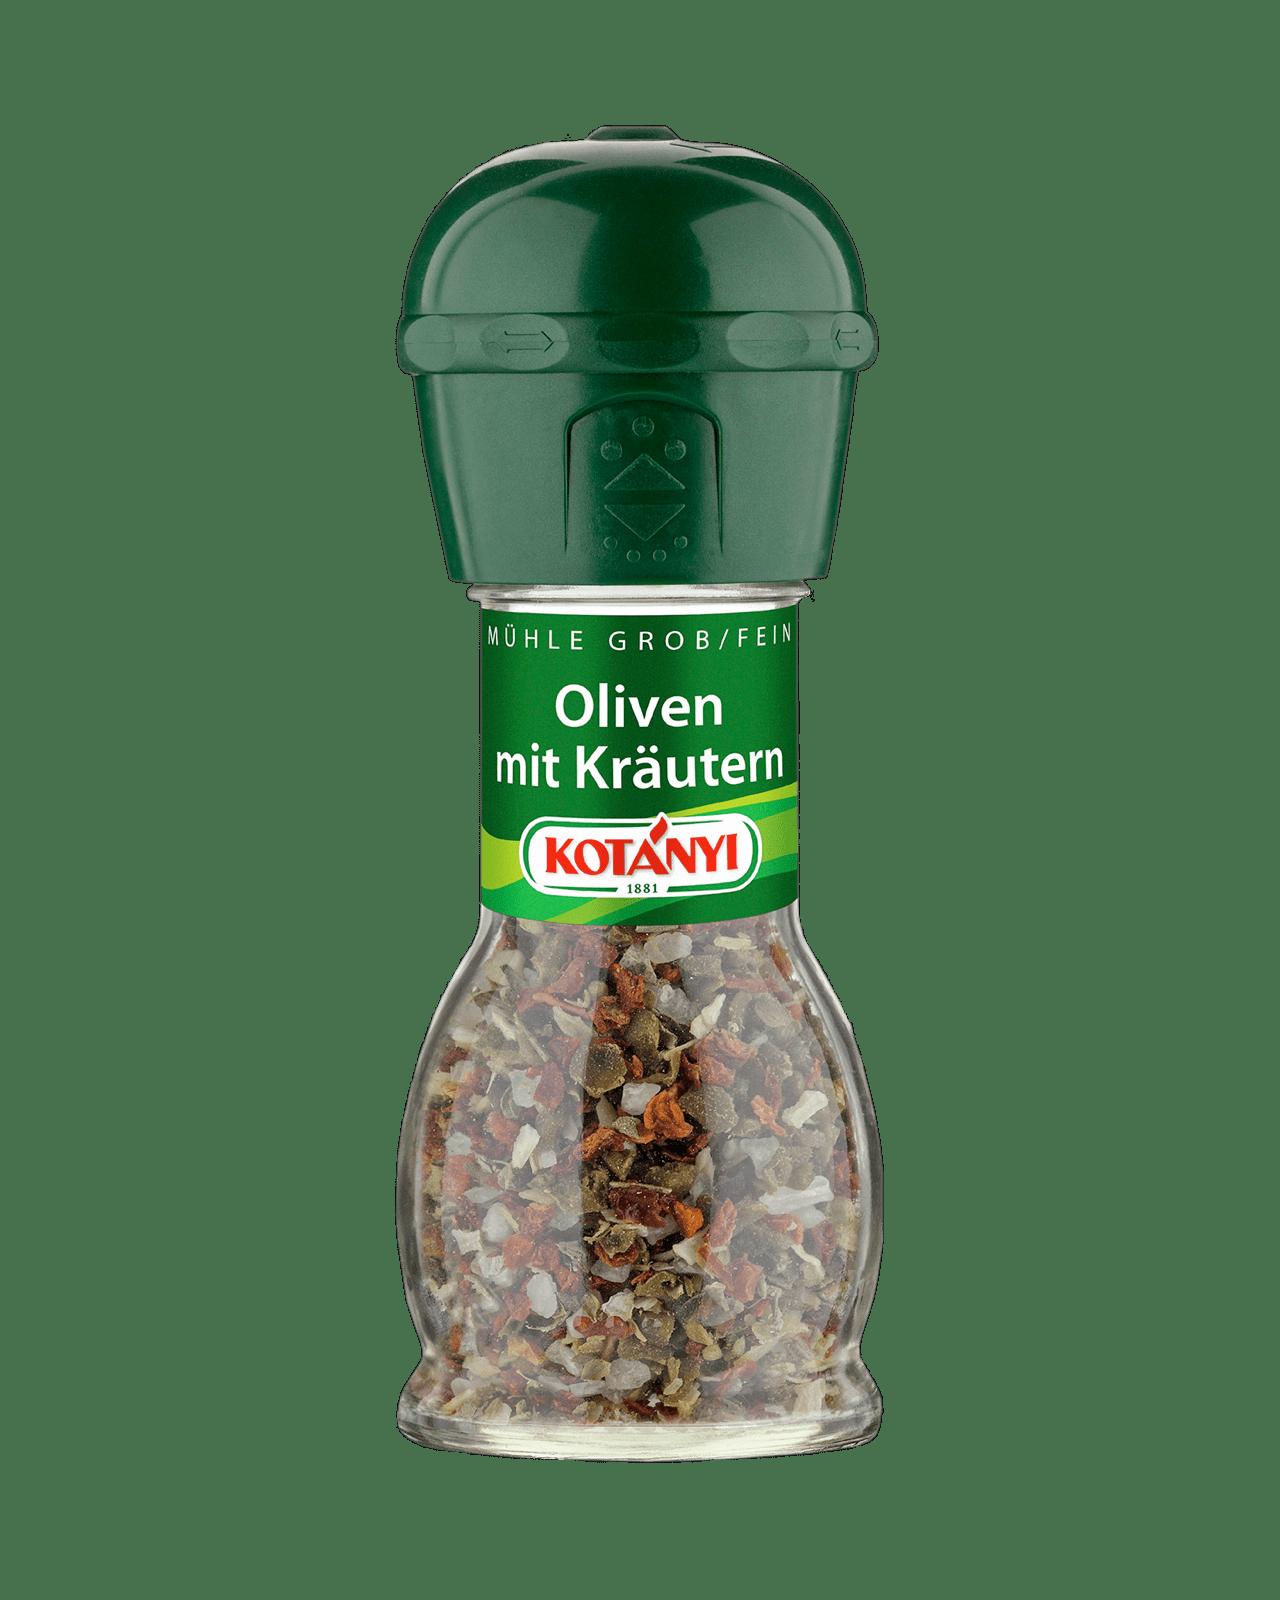 Kotányi Oliven mit Kräutern in der Mühle